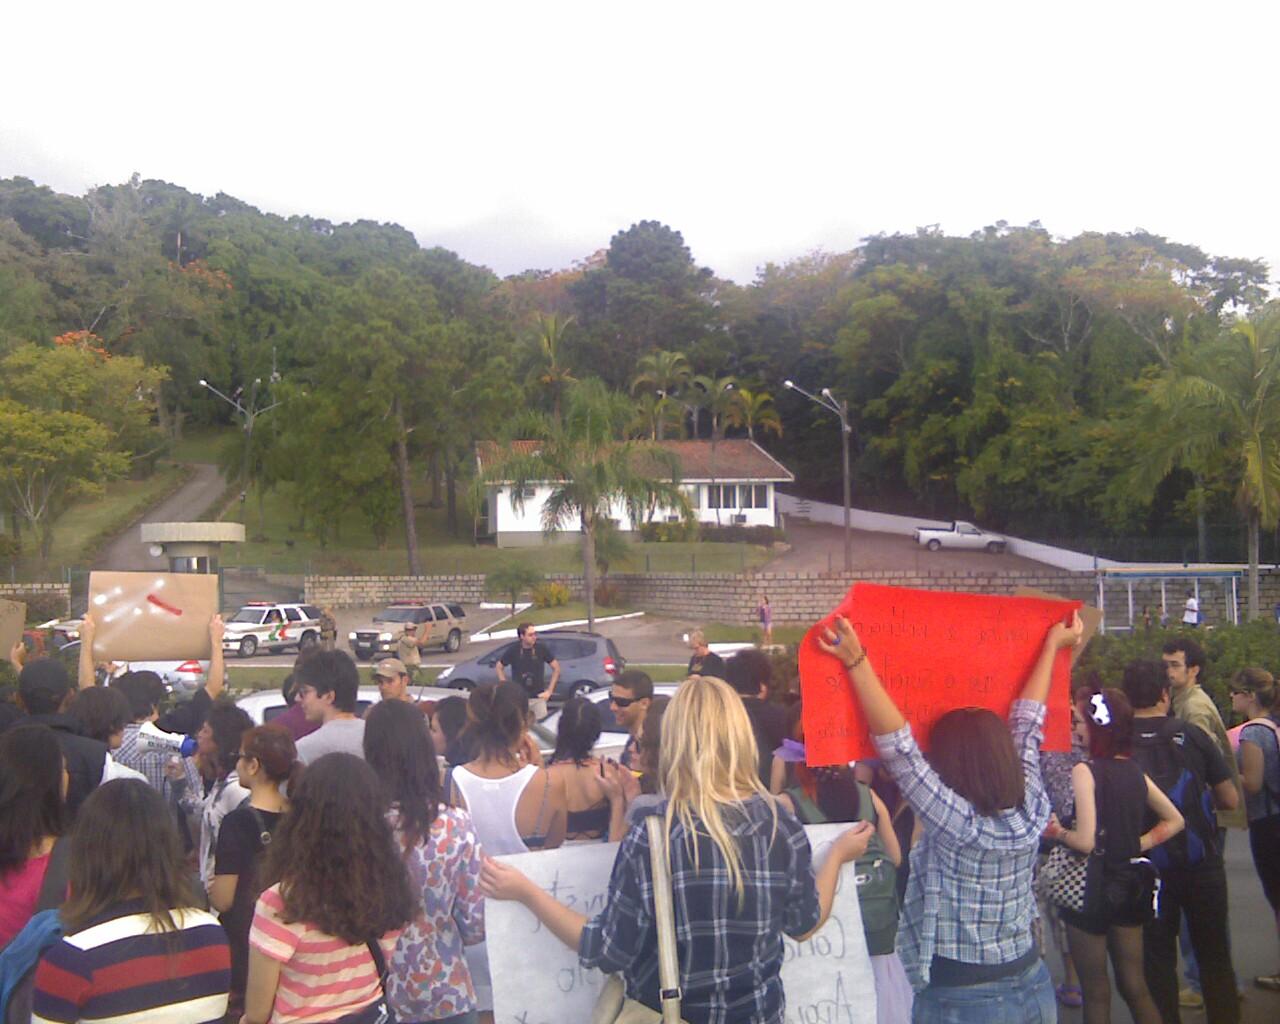 #MarchadaLiberdade #Floripa #ativismo